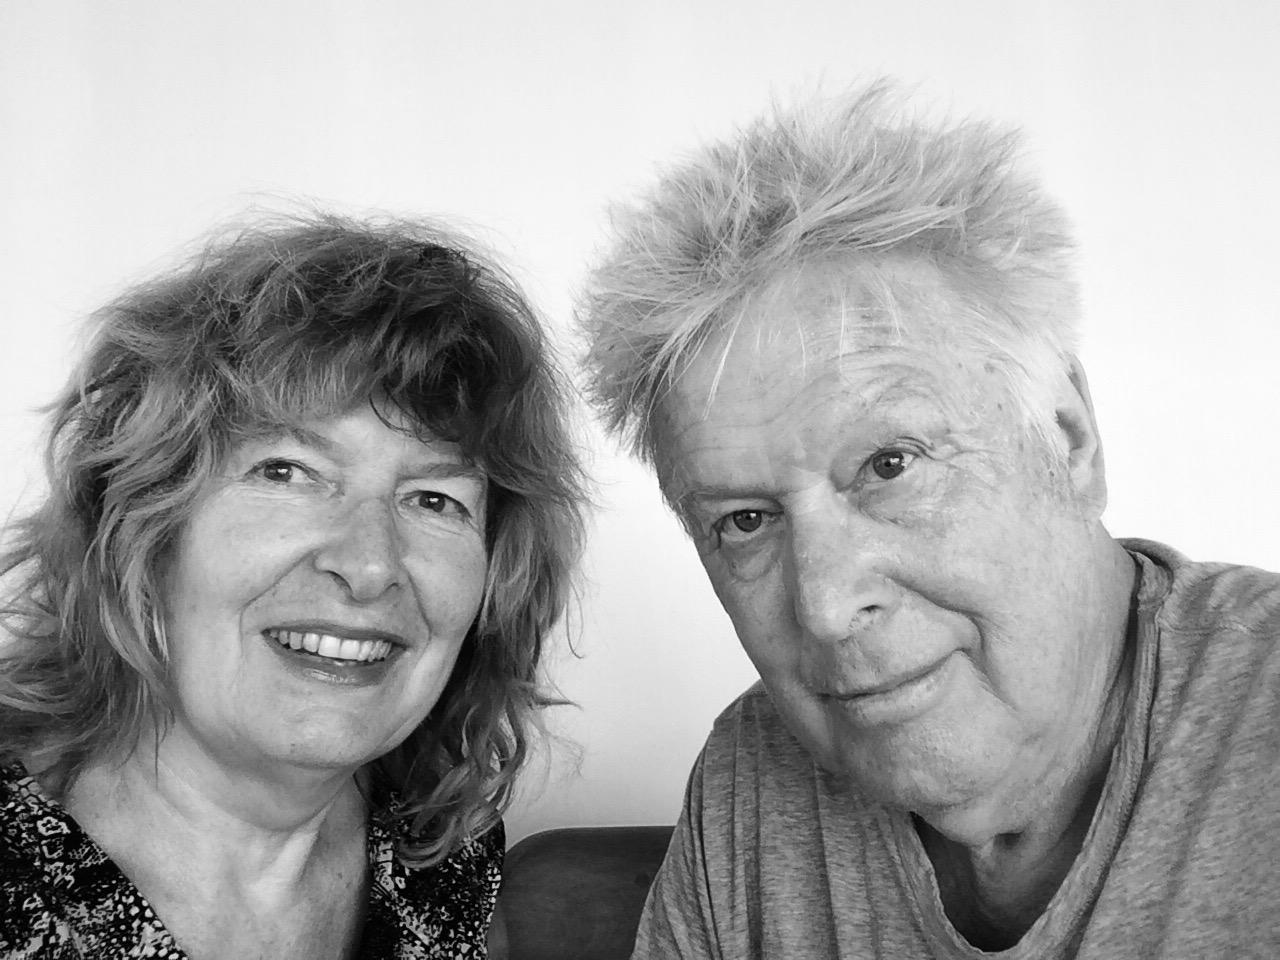 Jörg Jeshel & Brigitte Kramer